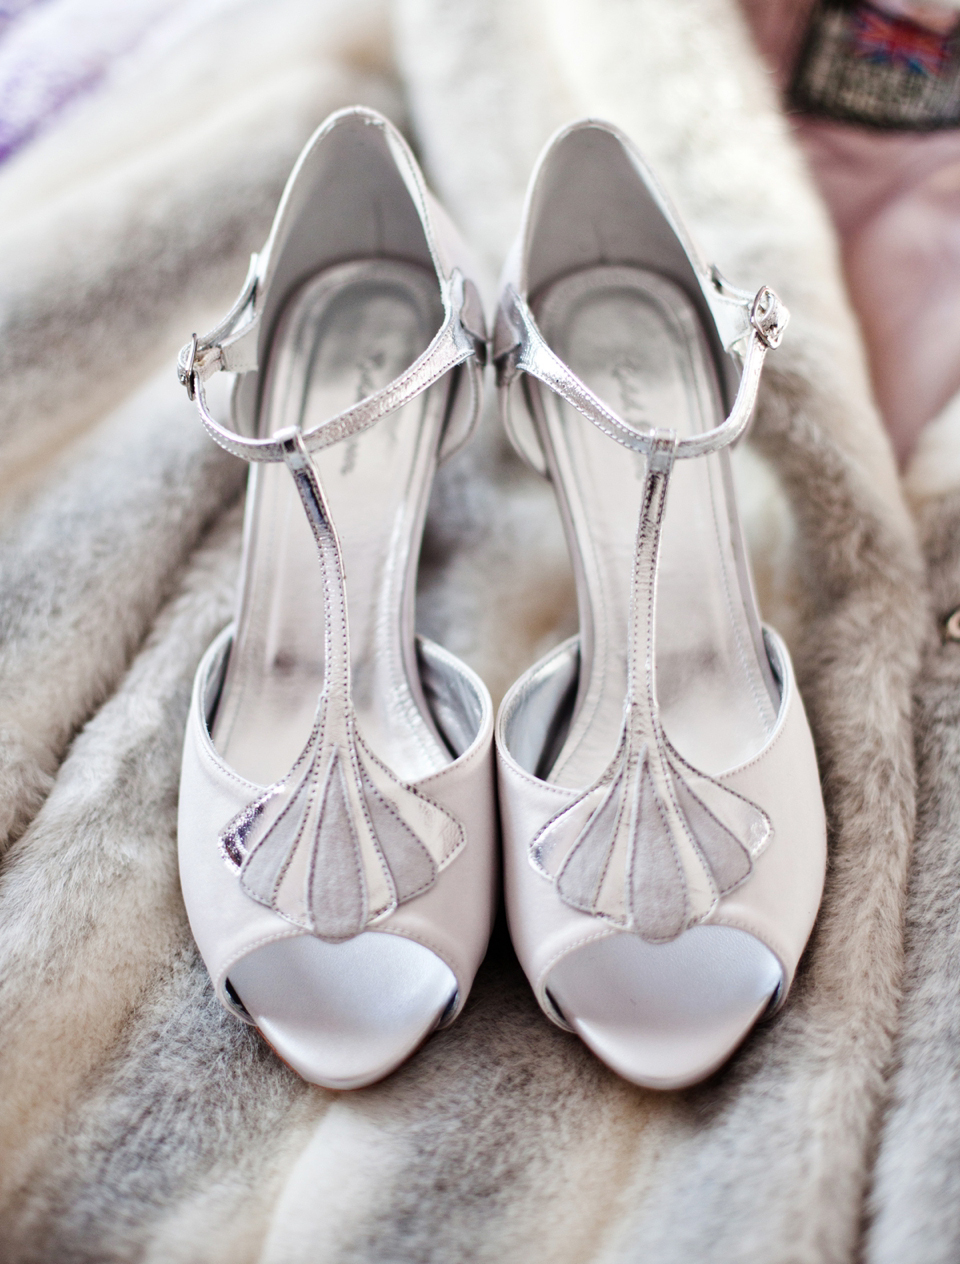 Silver Wedding Shoes 79 Fresh An Elegant uAudrey Hepburn